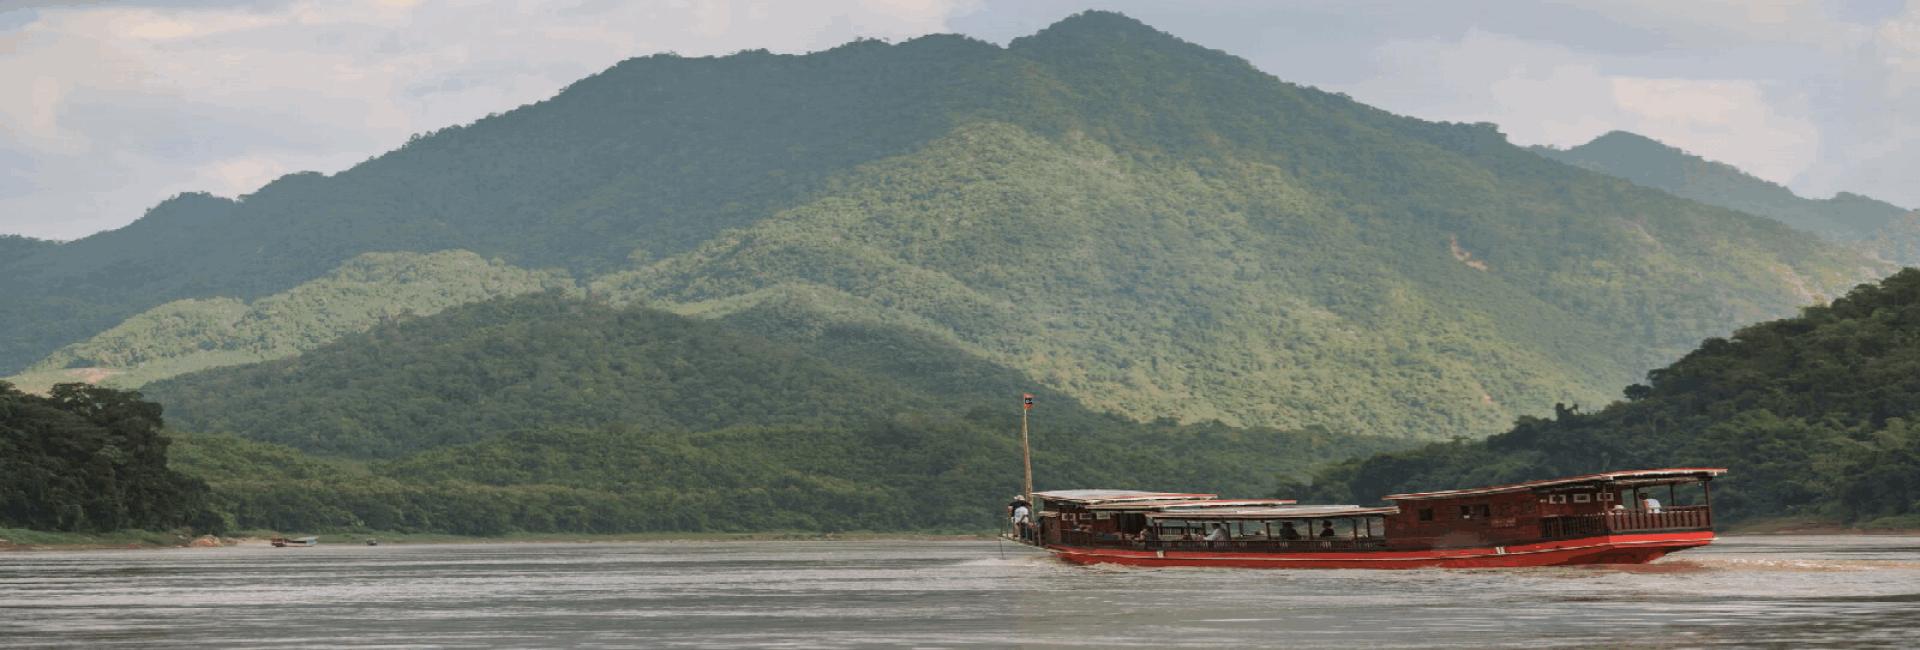 Meet the Mighty Mekong in Laos